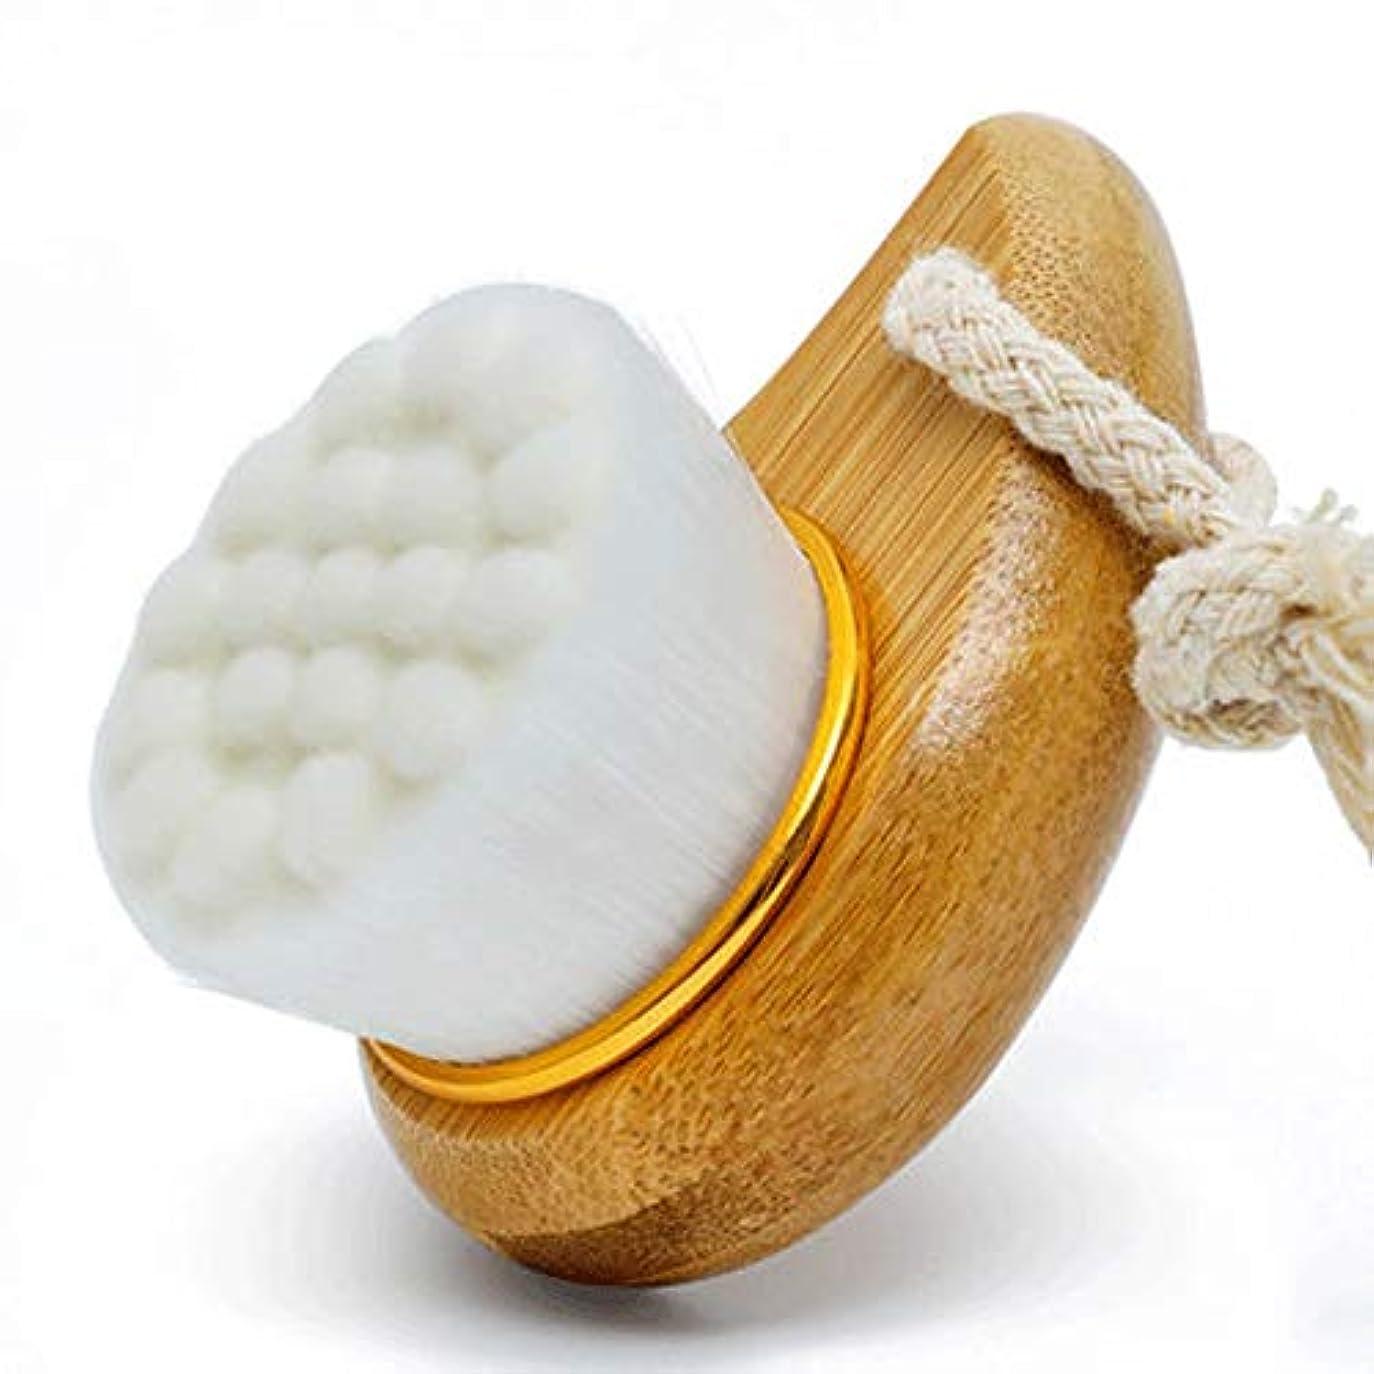 HEHUIHUI- クレンジングブラシ、防水ディープクレンジングポア、電気剥離、にきび、アンチエイジングクレンジングブラシ(ホワイト) (Color : White)